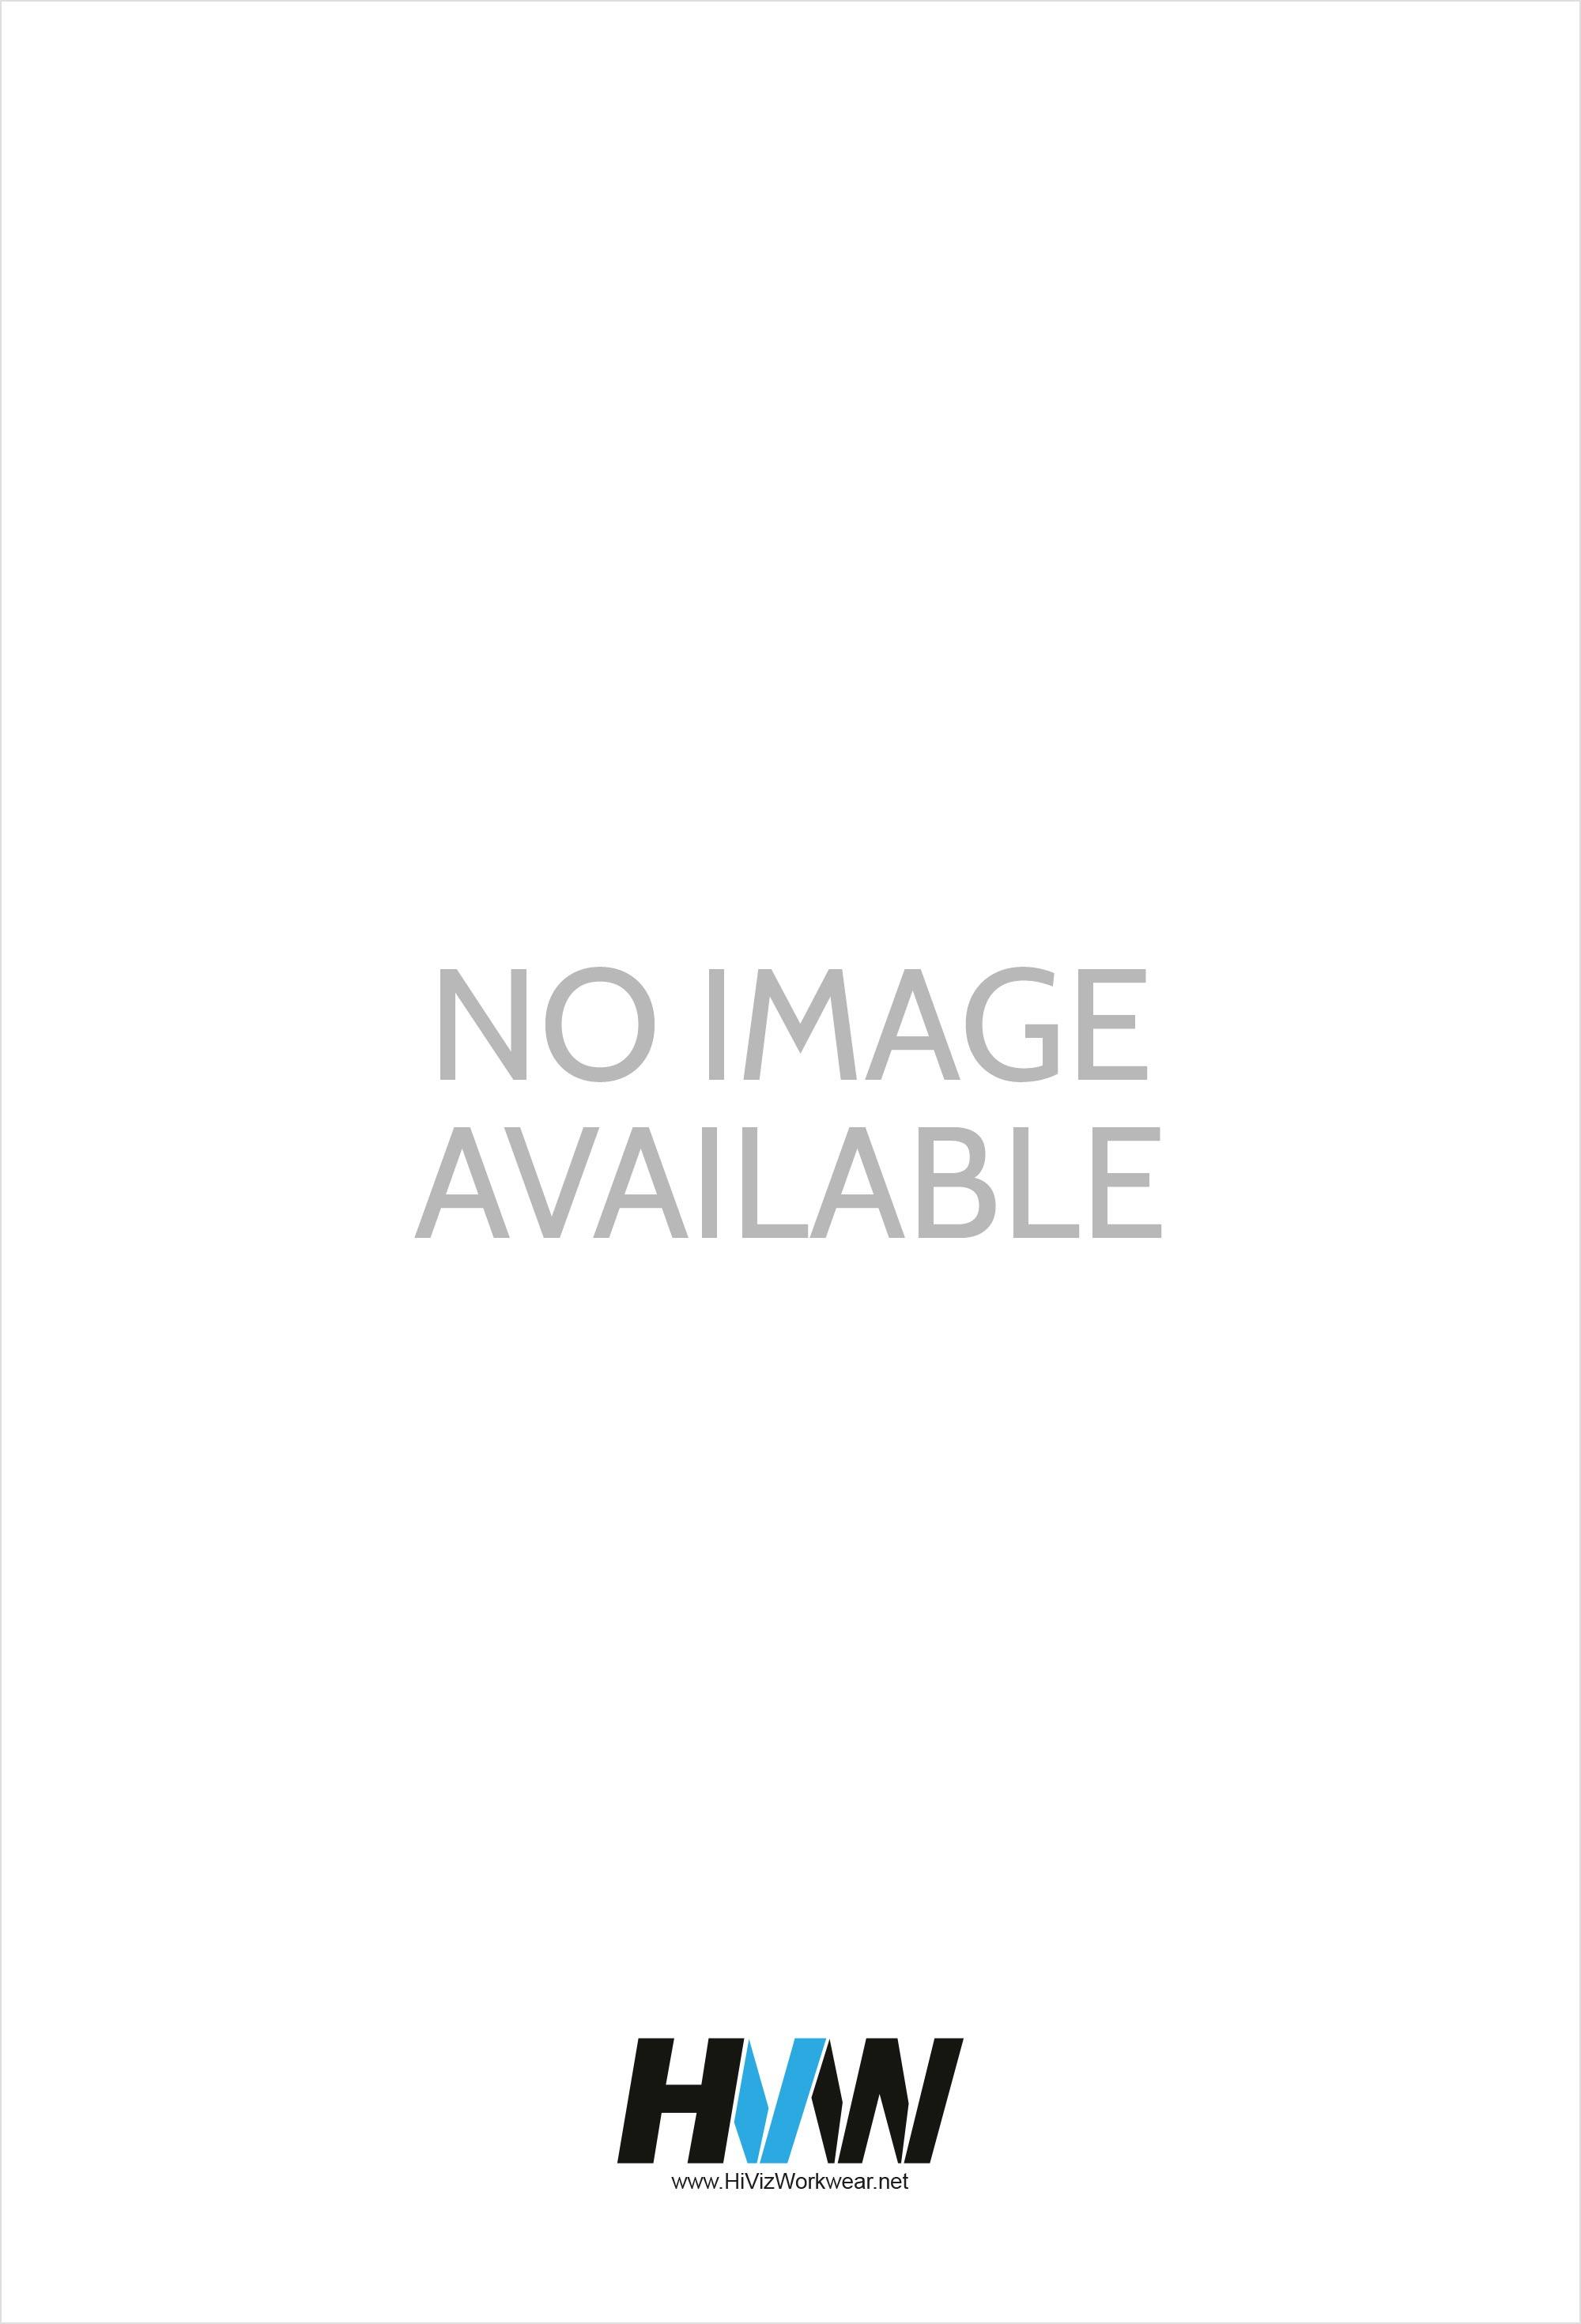 S171 Cotton Comfort Polo Shirt (Small To 3XL)